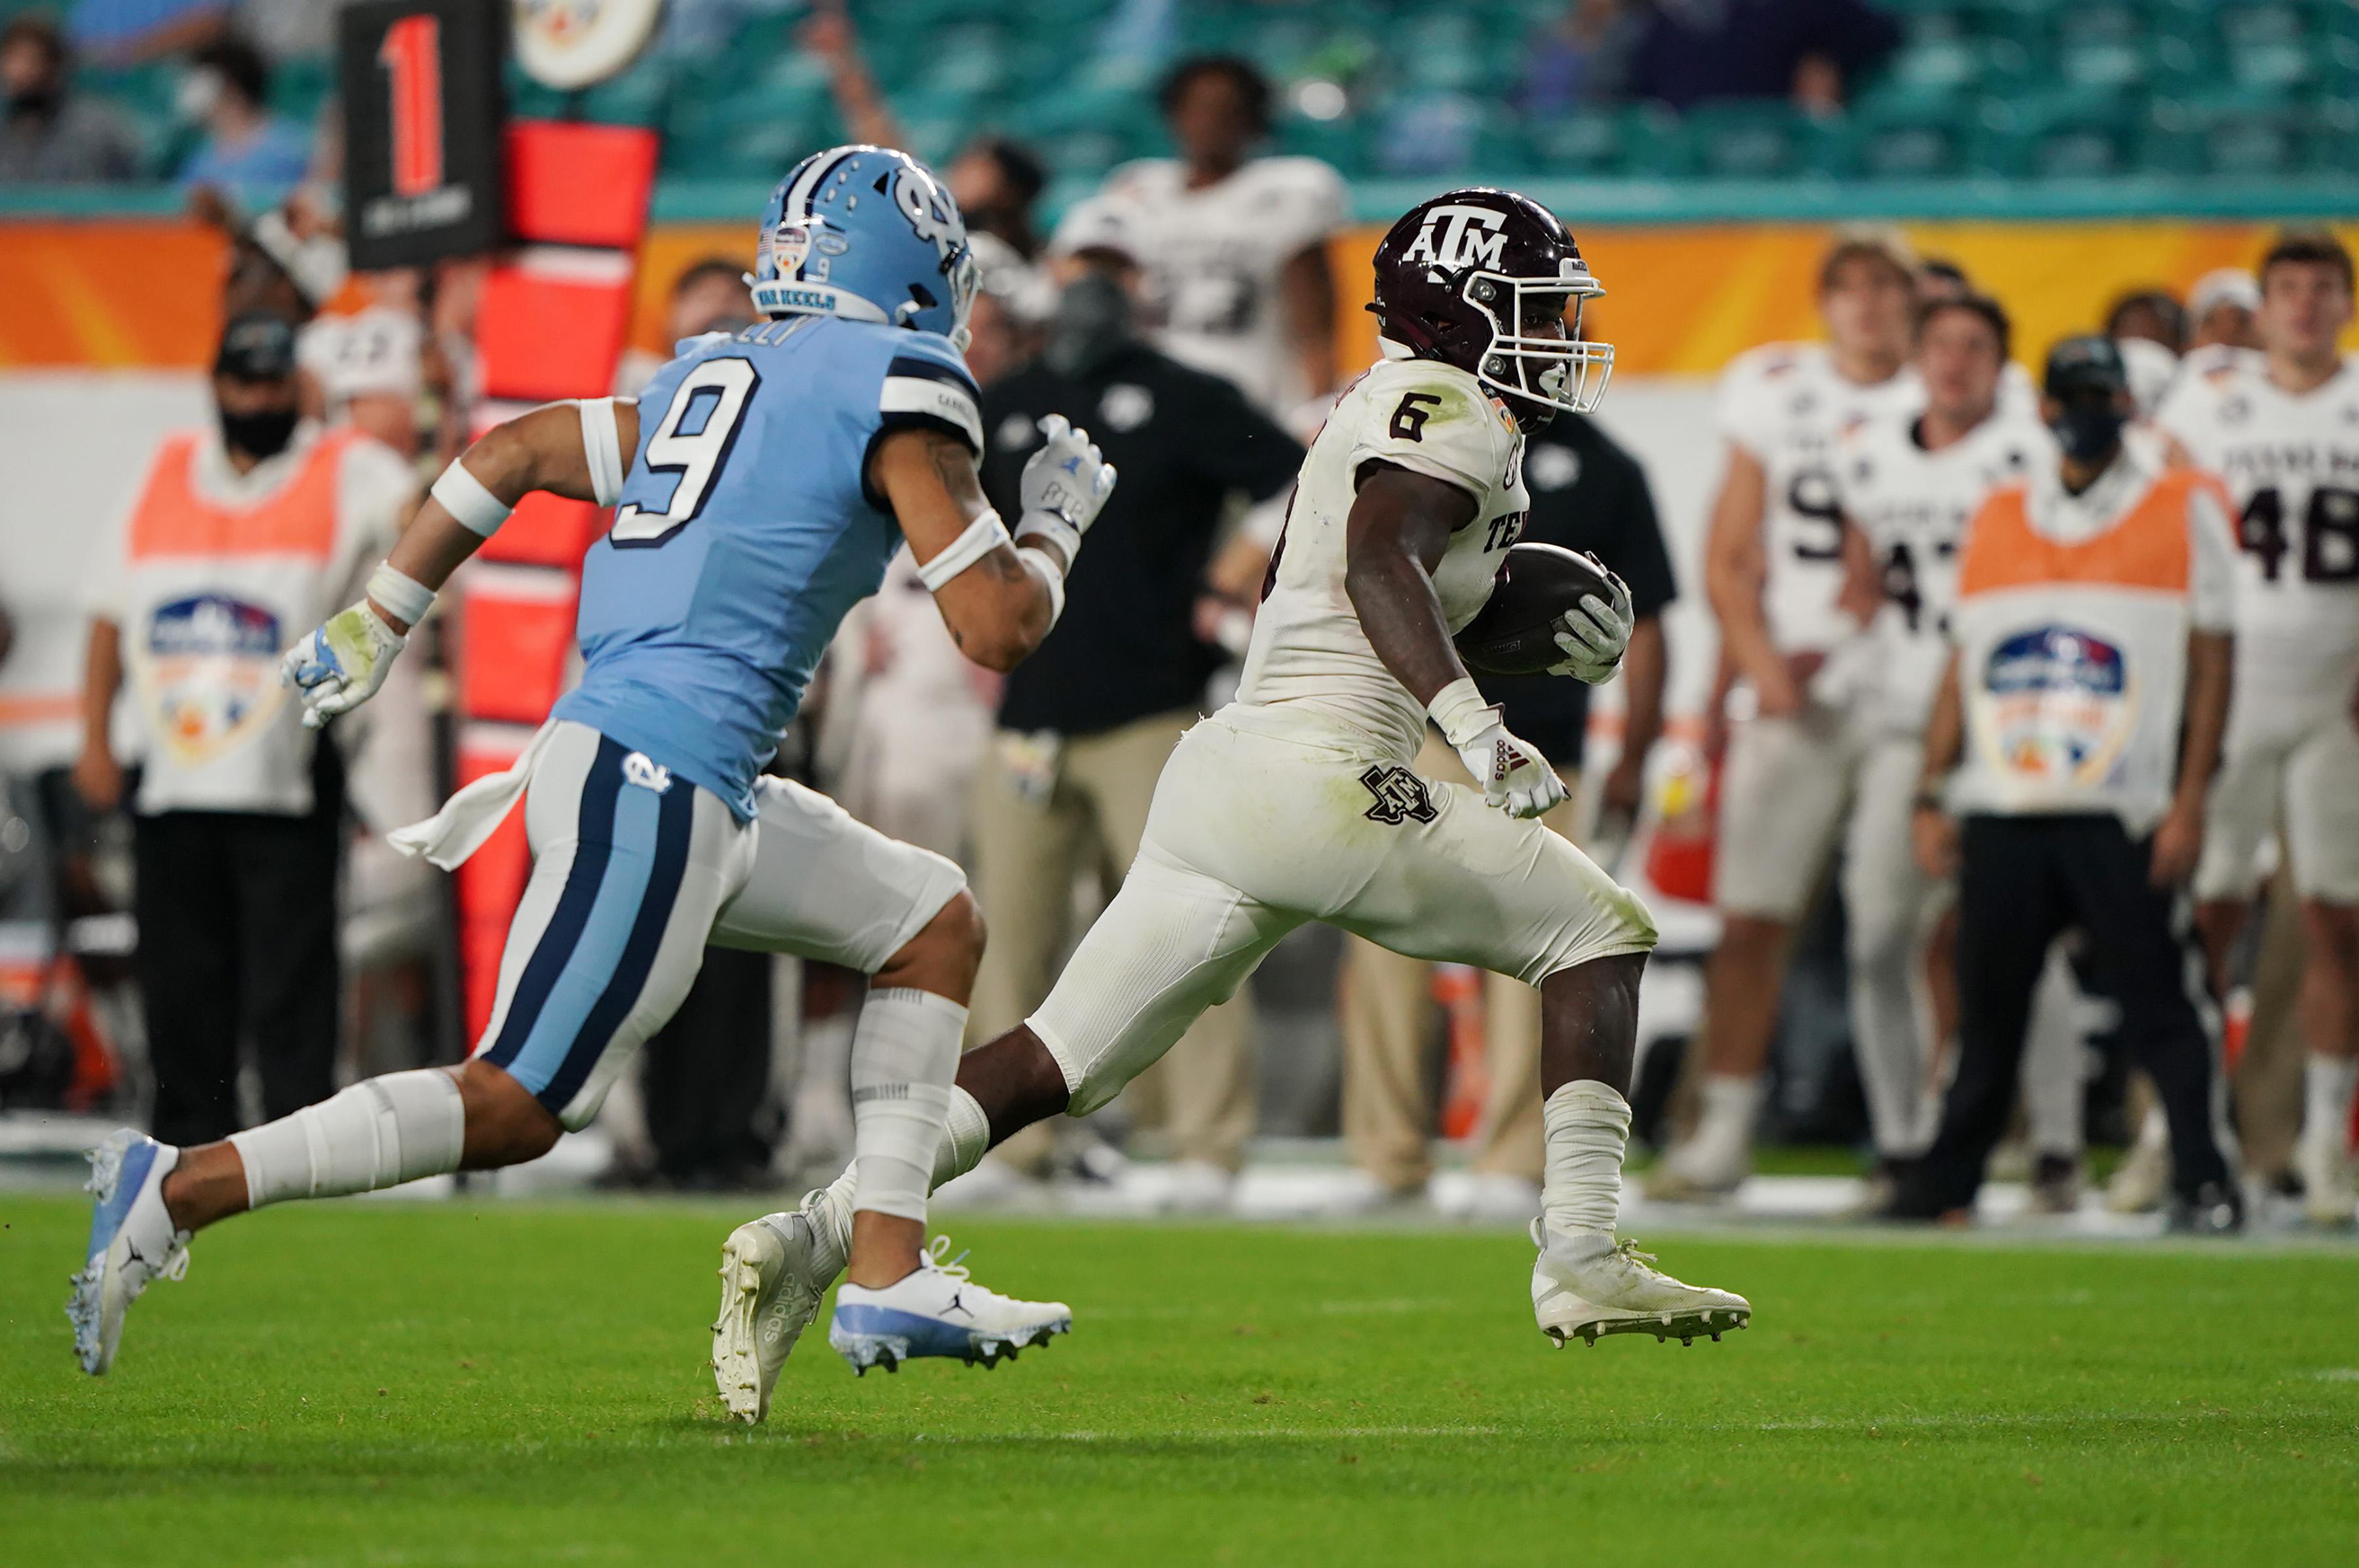 Texas A&M Aggies running back Devon Achane runs past North Carolina Tar Heels defensive back Cam'Ron Kelly for a 76-yard touchdown during the second half at Hard Rock Stadium.